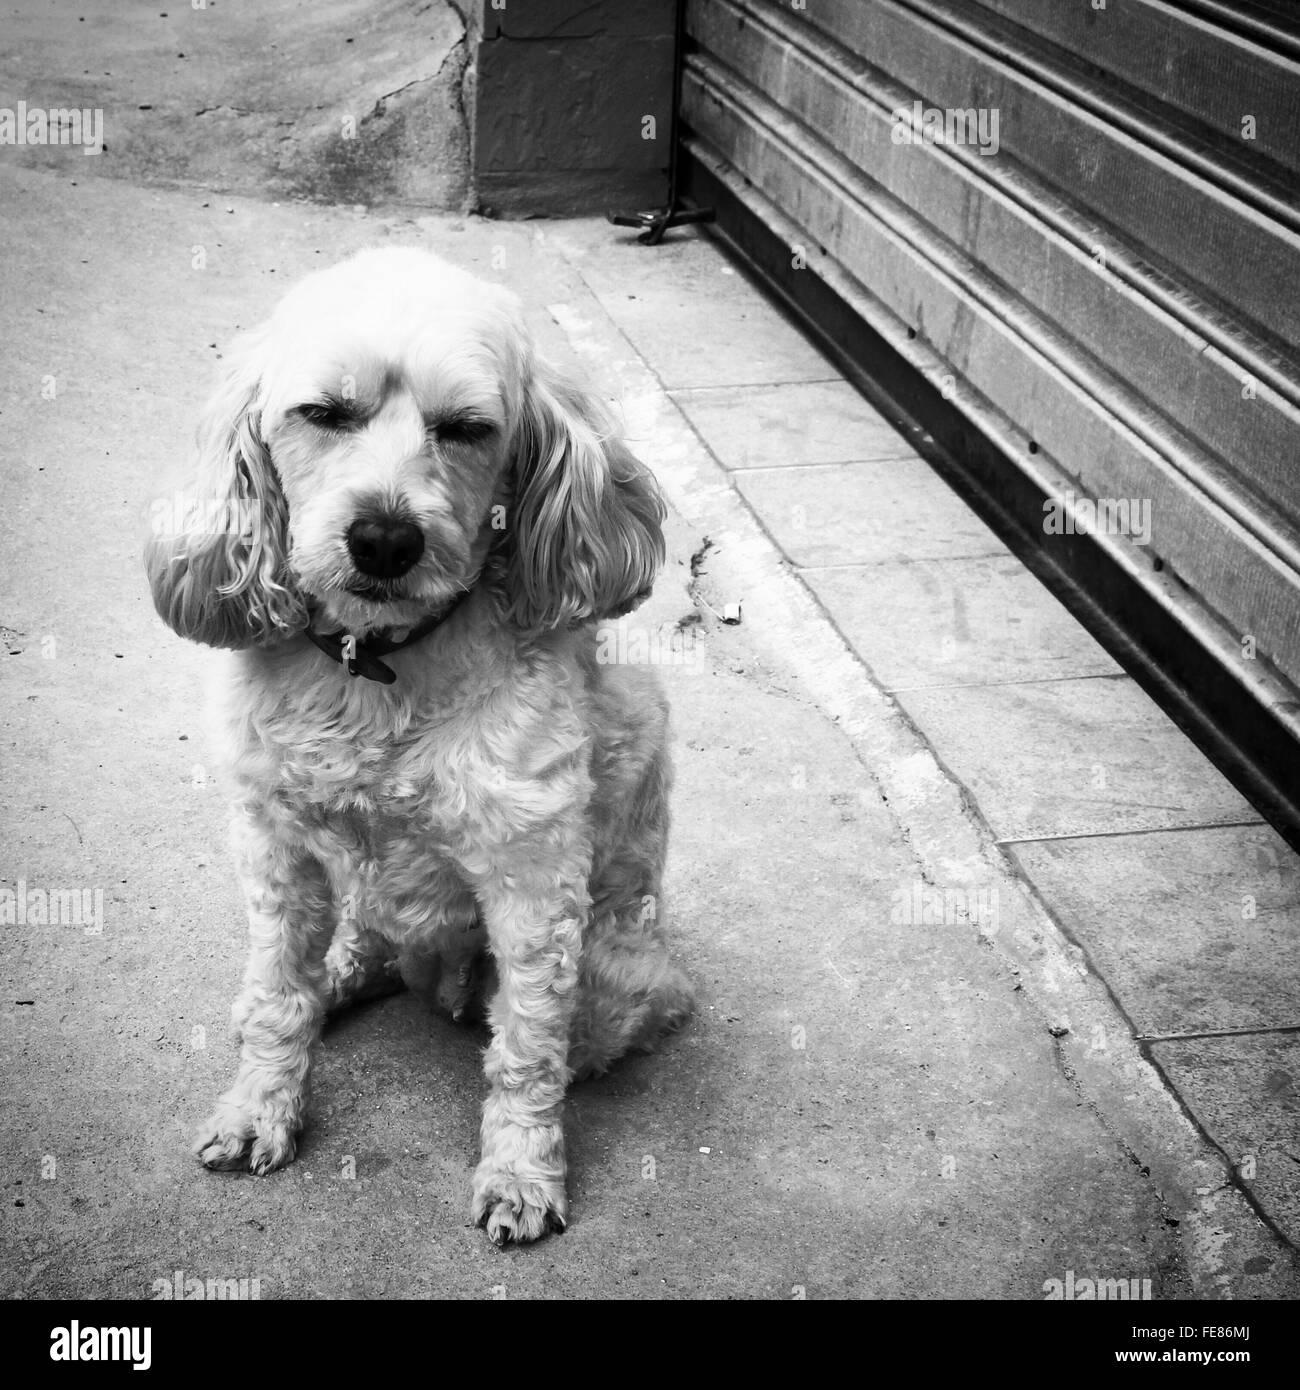 Close-Up Of Dog Sitting On Street - Stock Image